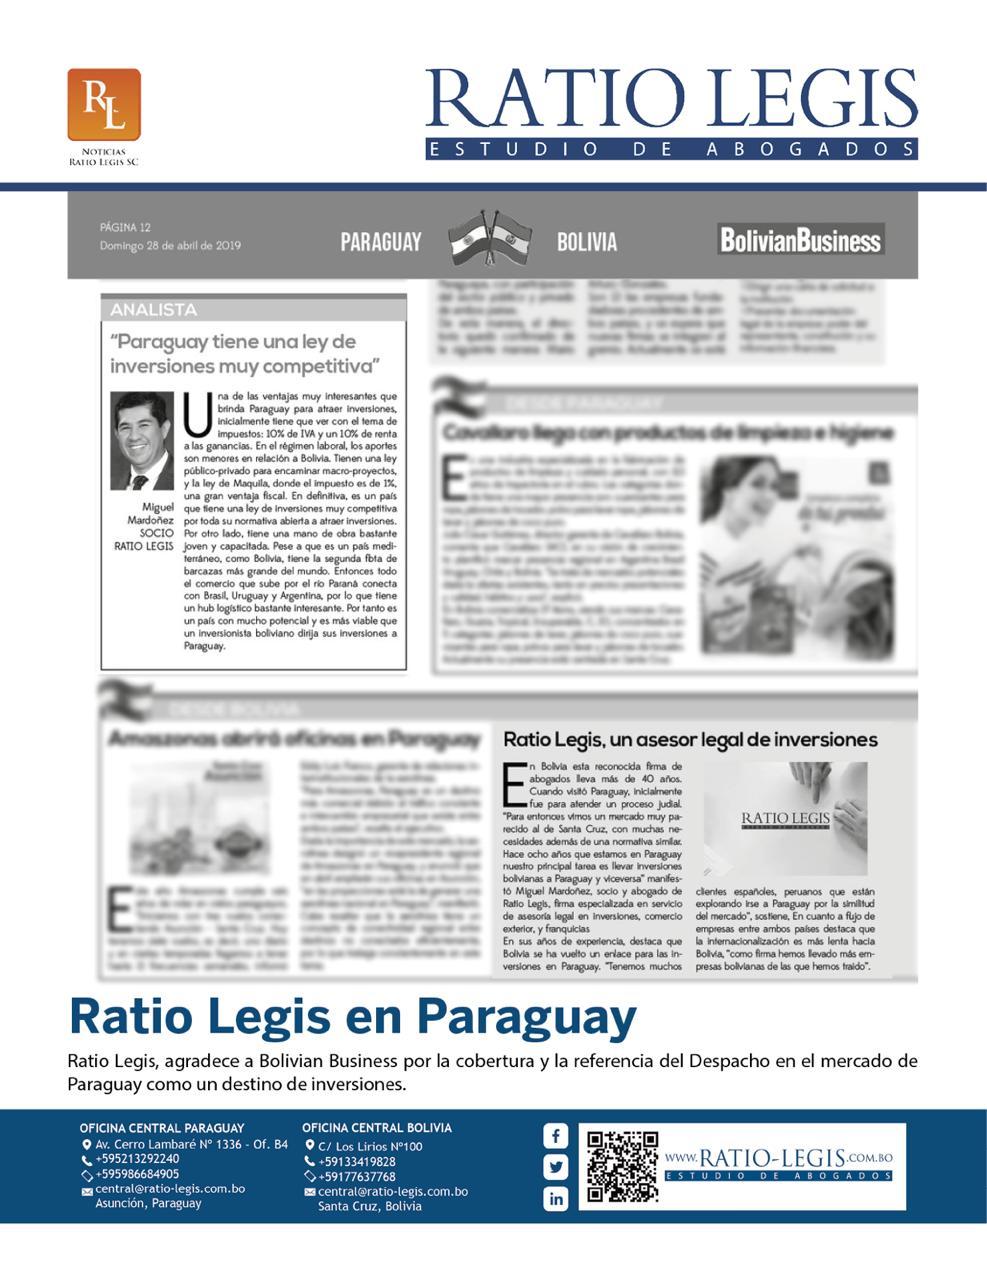 Ratio Legis en Paraguay